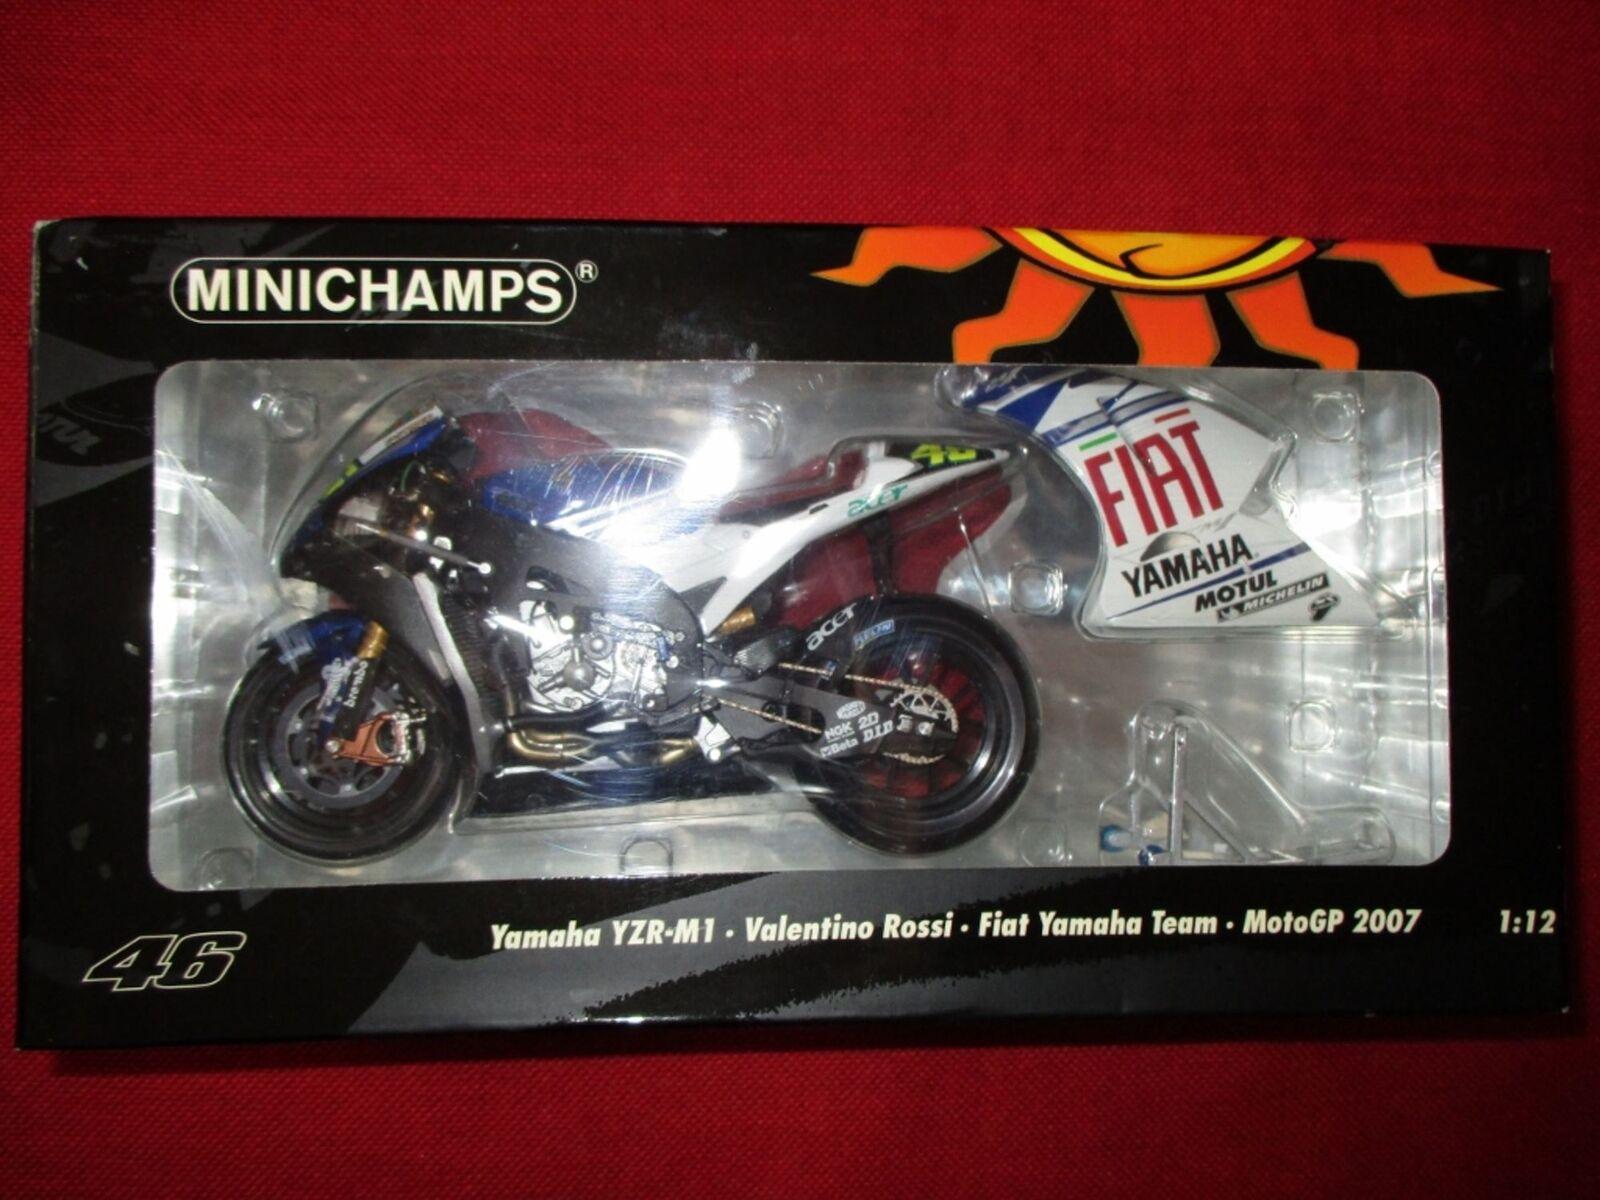 MINICHAMPS ® 122 073046 1 12 Yamaha yzr-m1 V. Rossi Fiat Yamaha Team MotoGP 2007